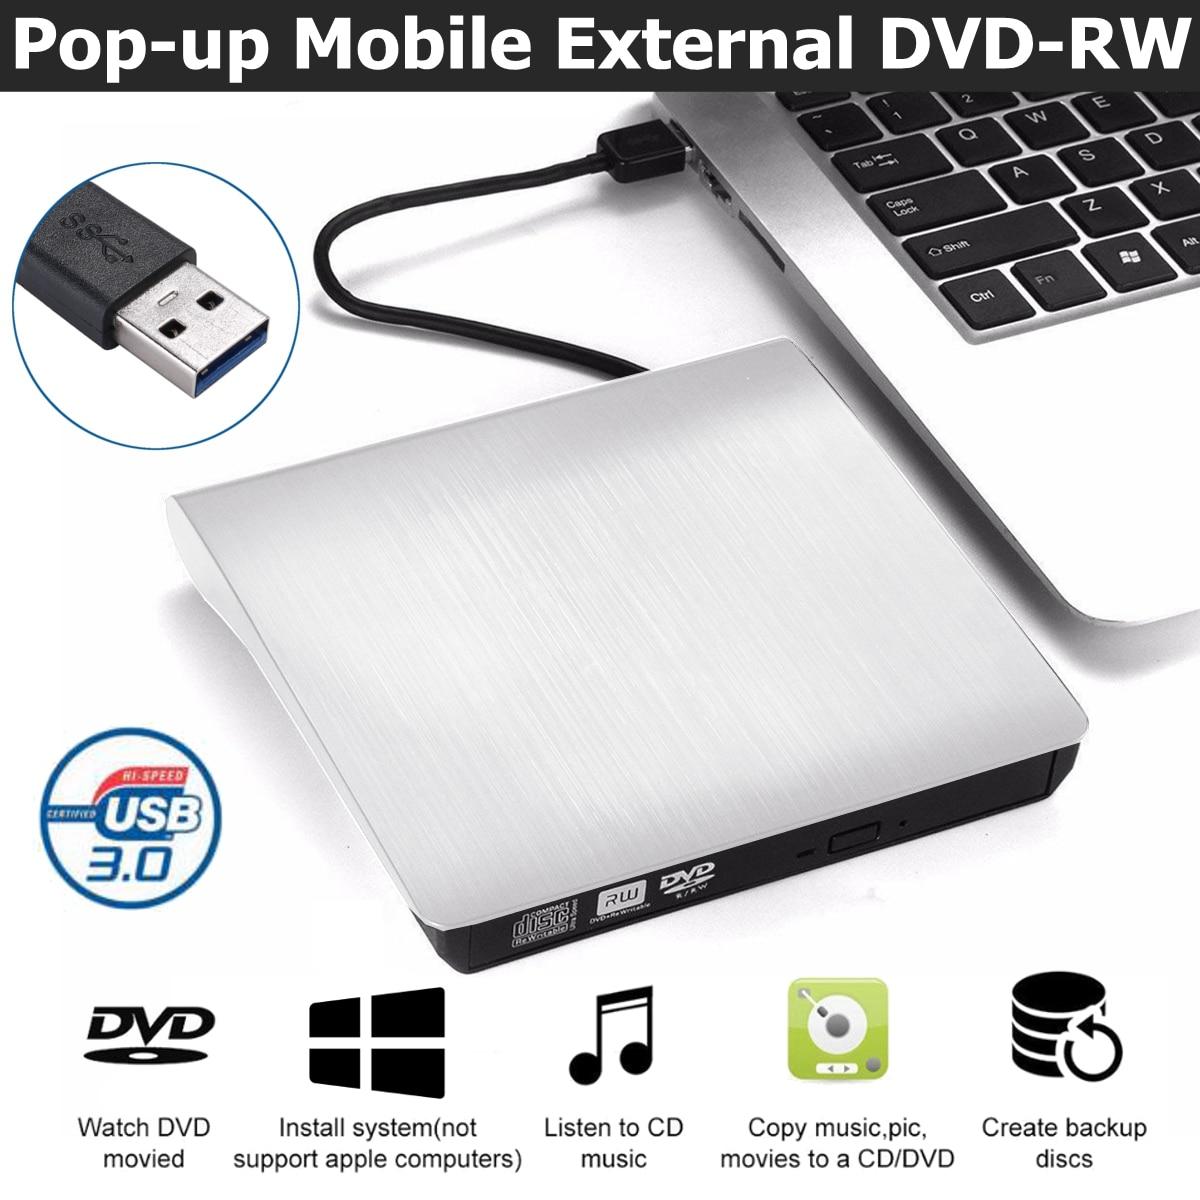 USB 3.0 External DVD-RW CD Burner Player Slim Optical Drive for PC Laptop